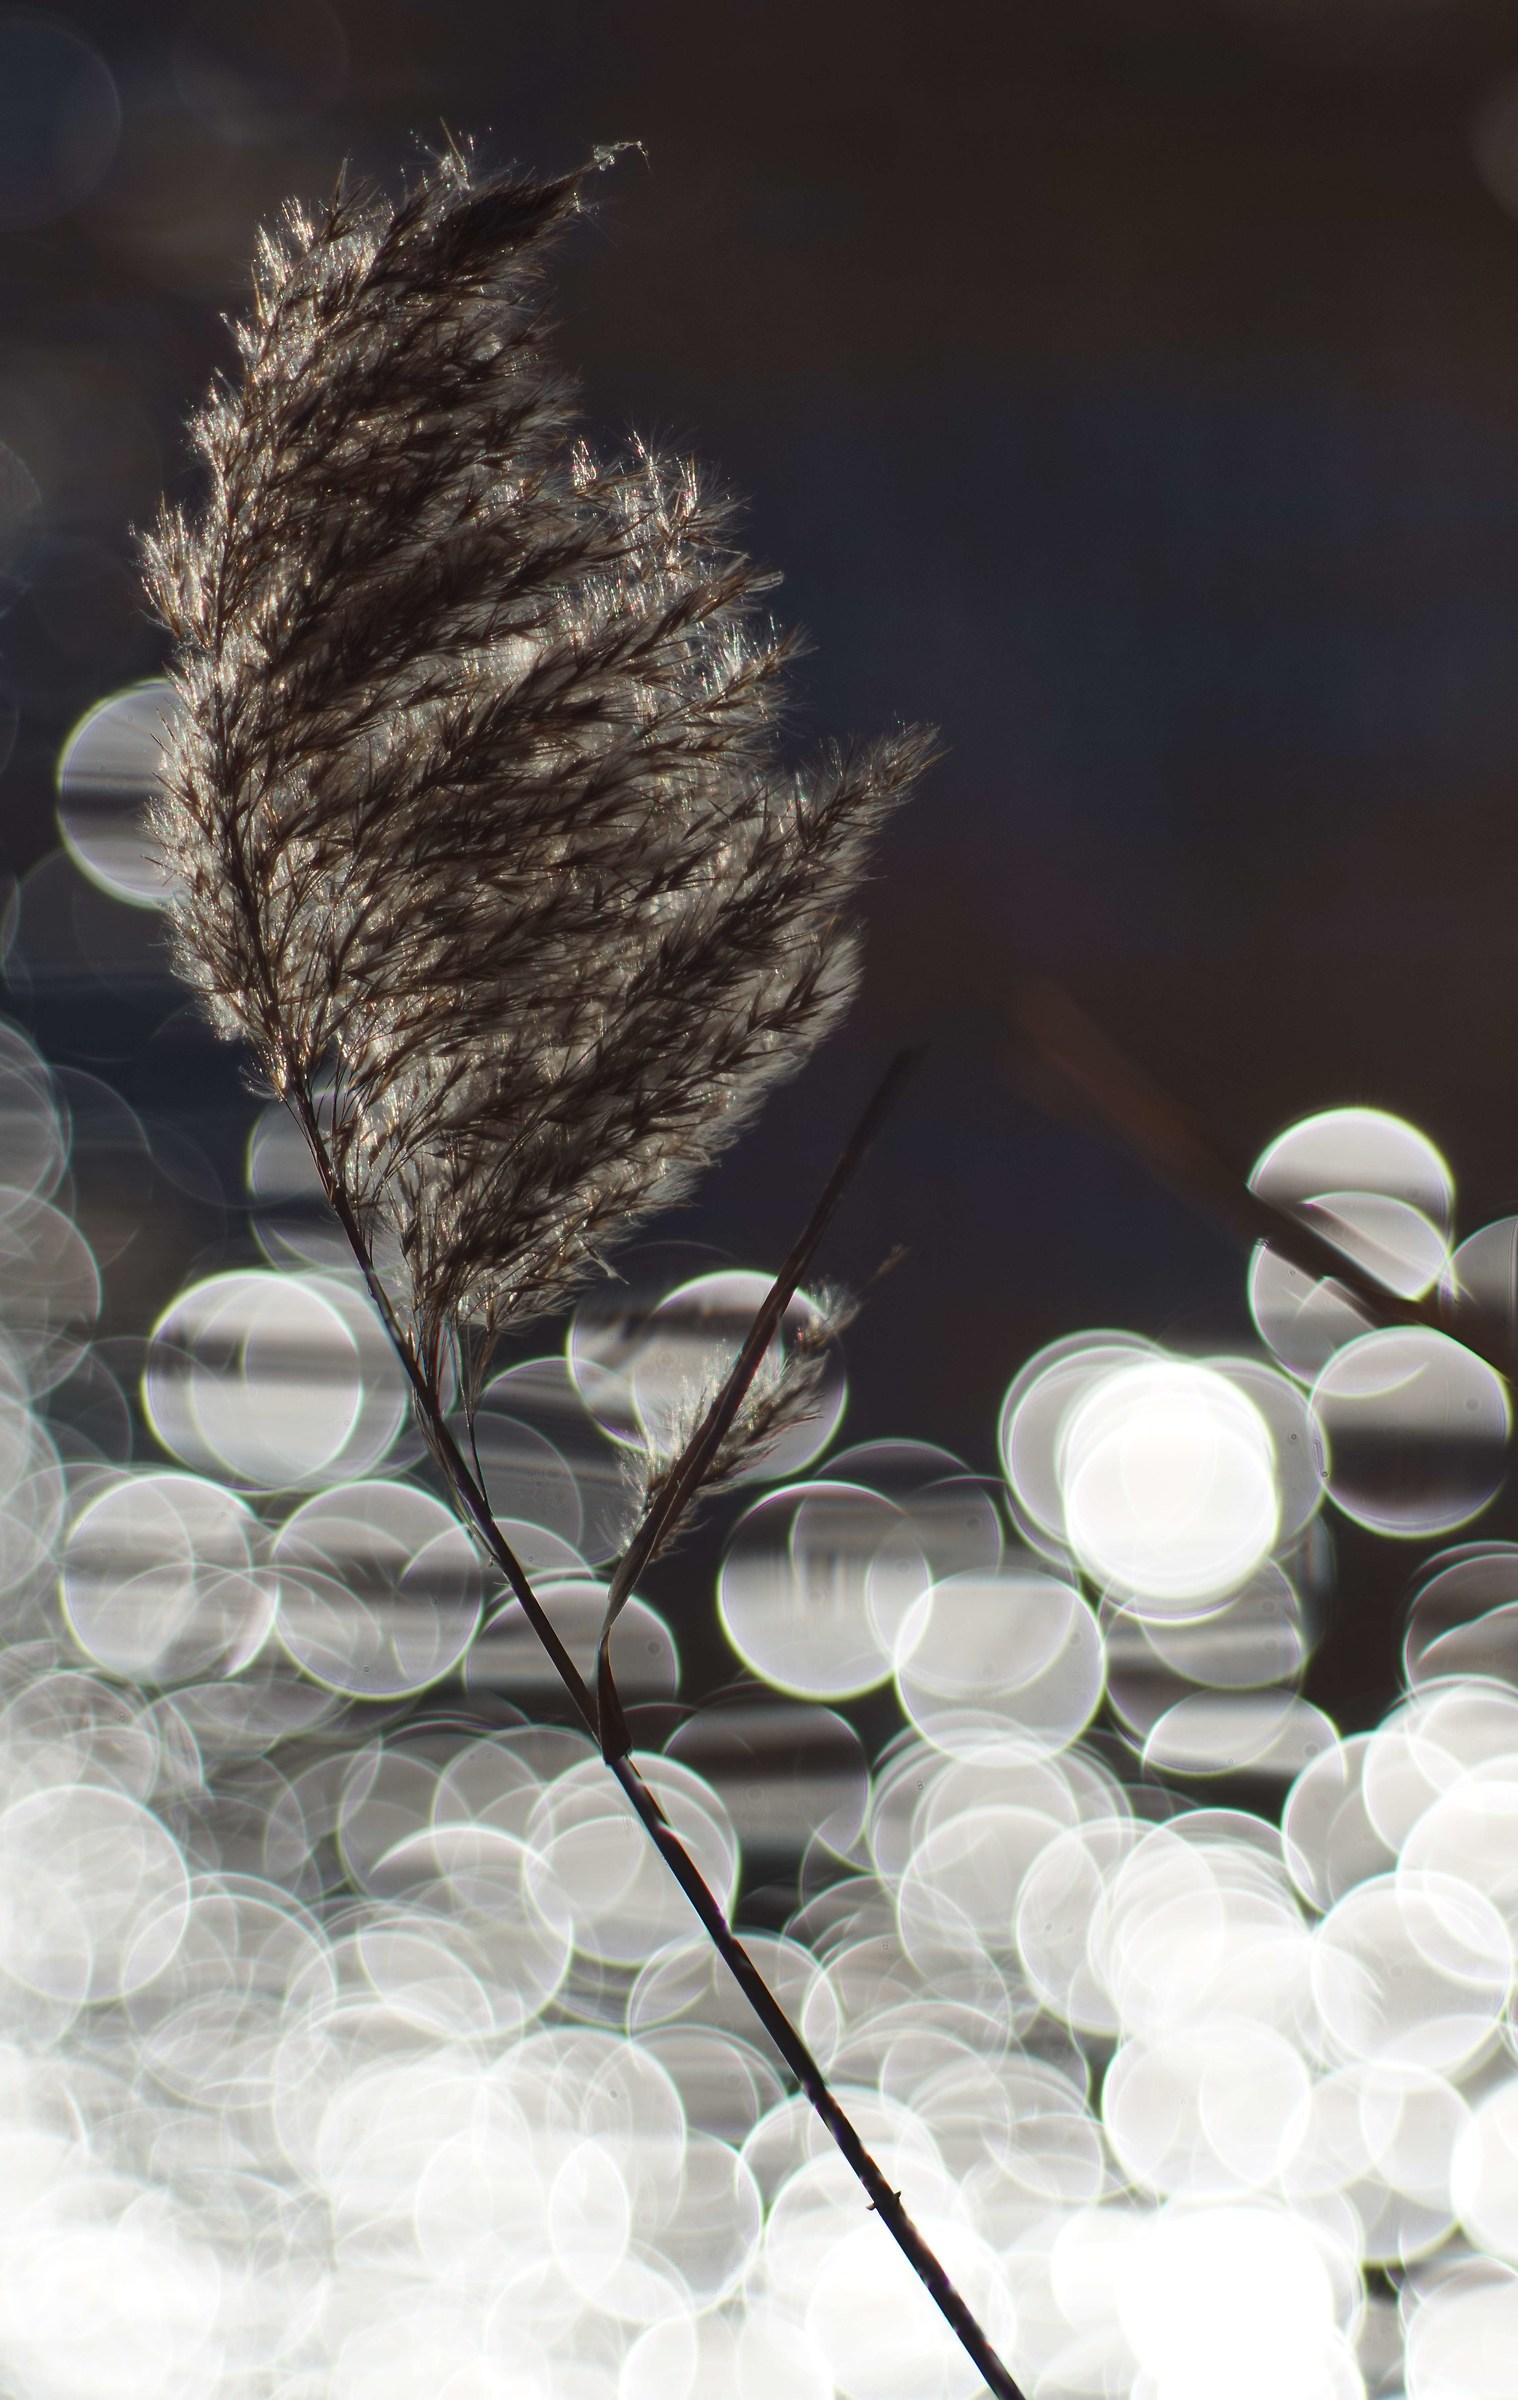 Bubbles of light...